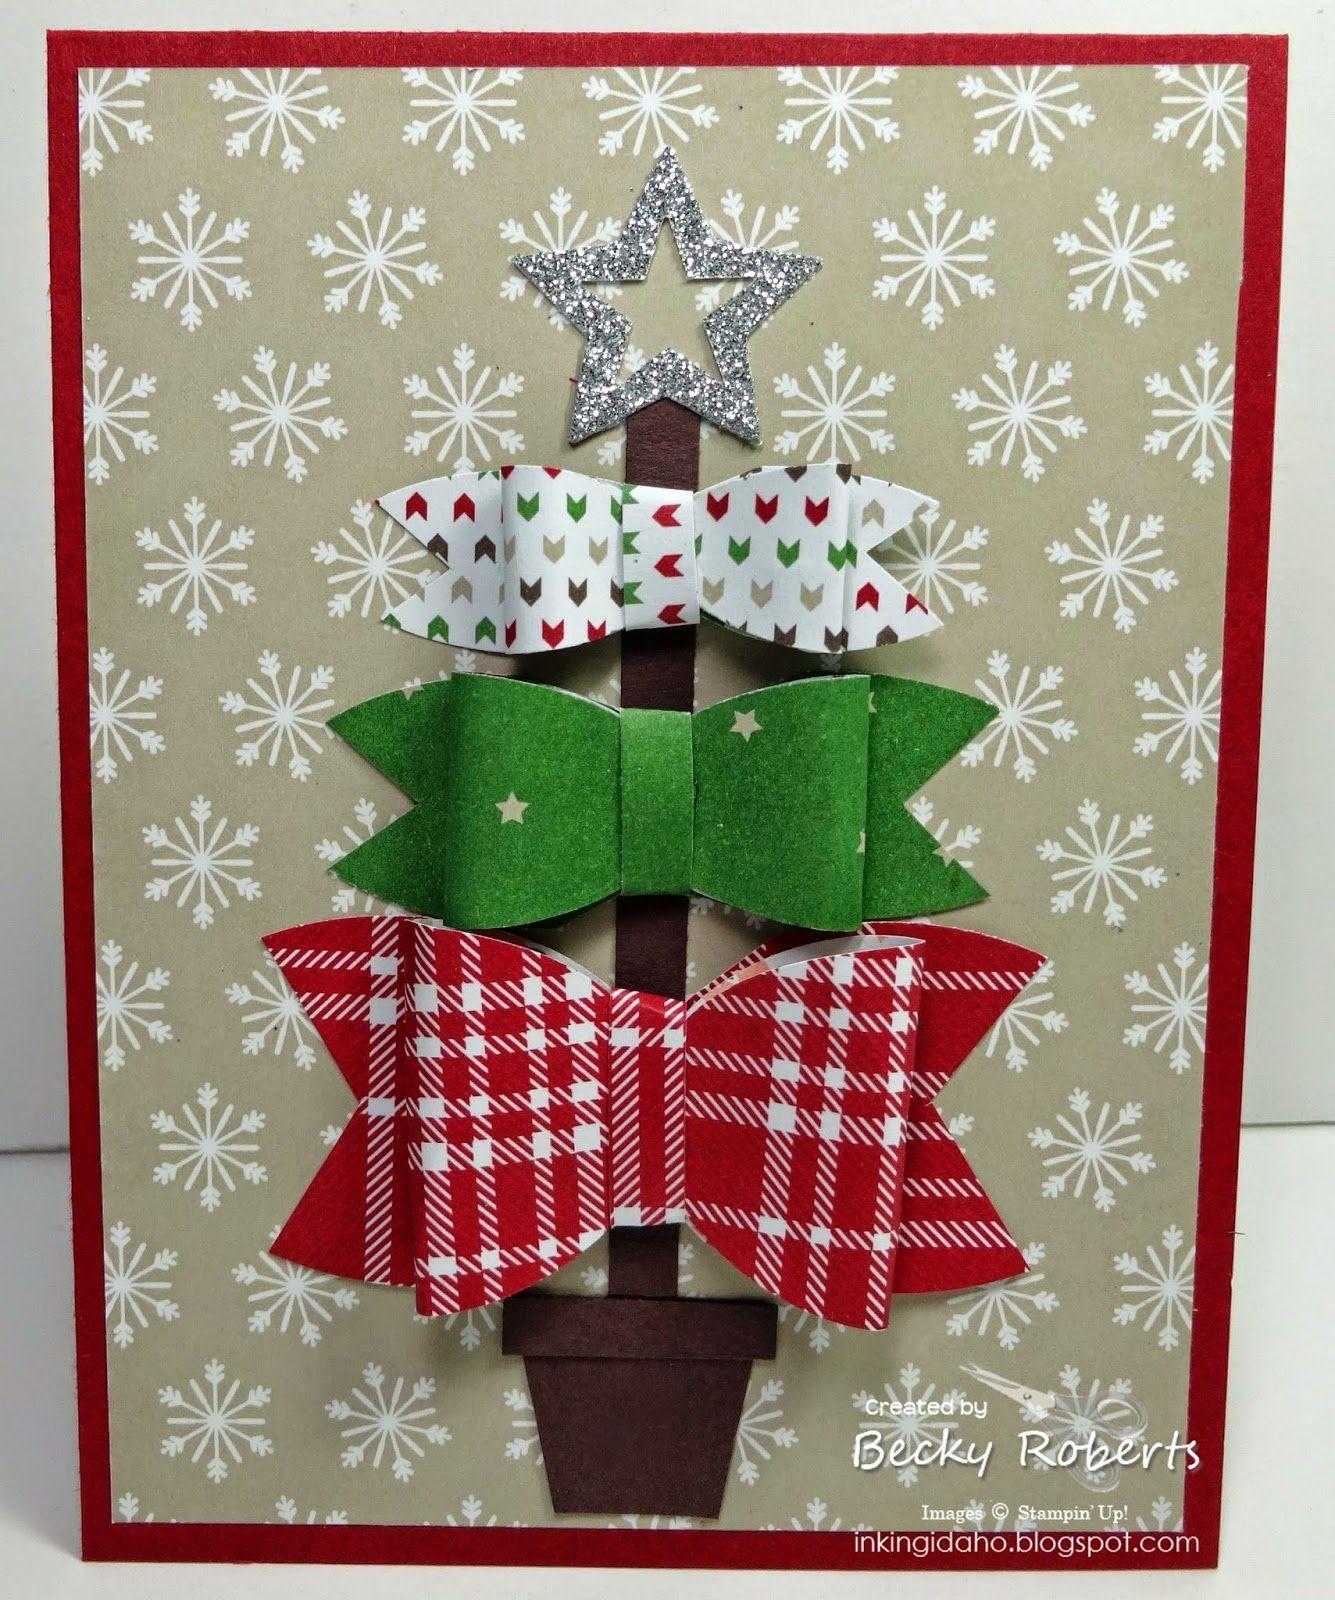 Inking Idaho Trim The Tree Bow Cards Christmas Cards Handmade Christmas Cards To Make Homemade Christmas Cards